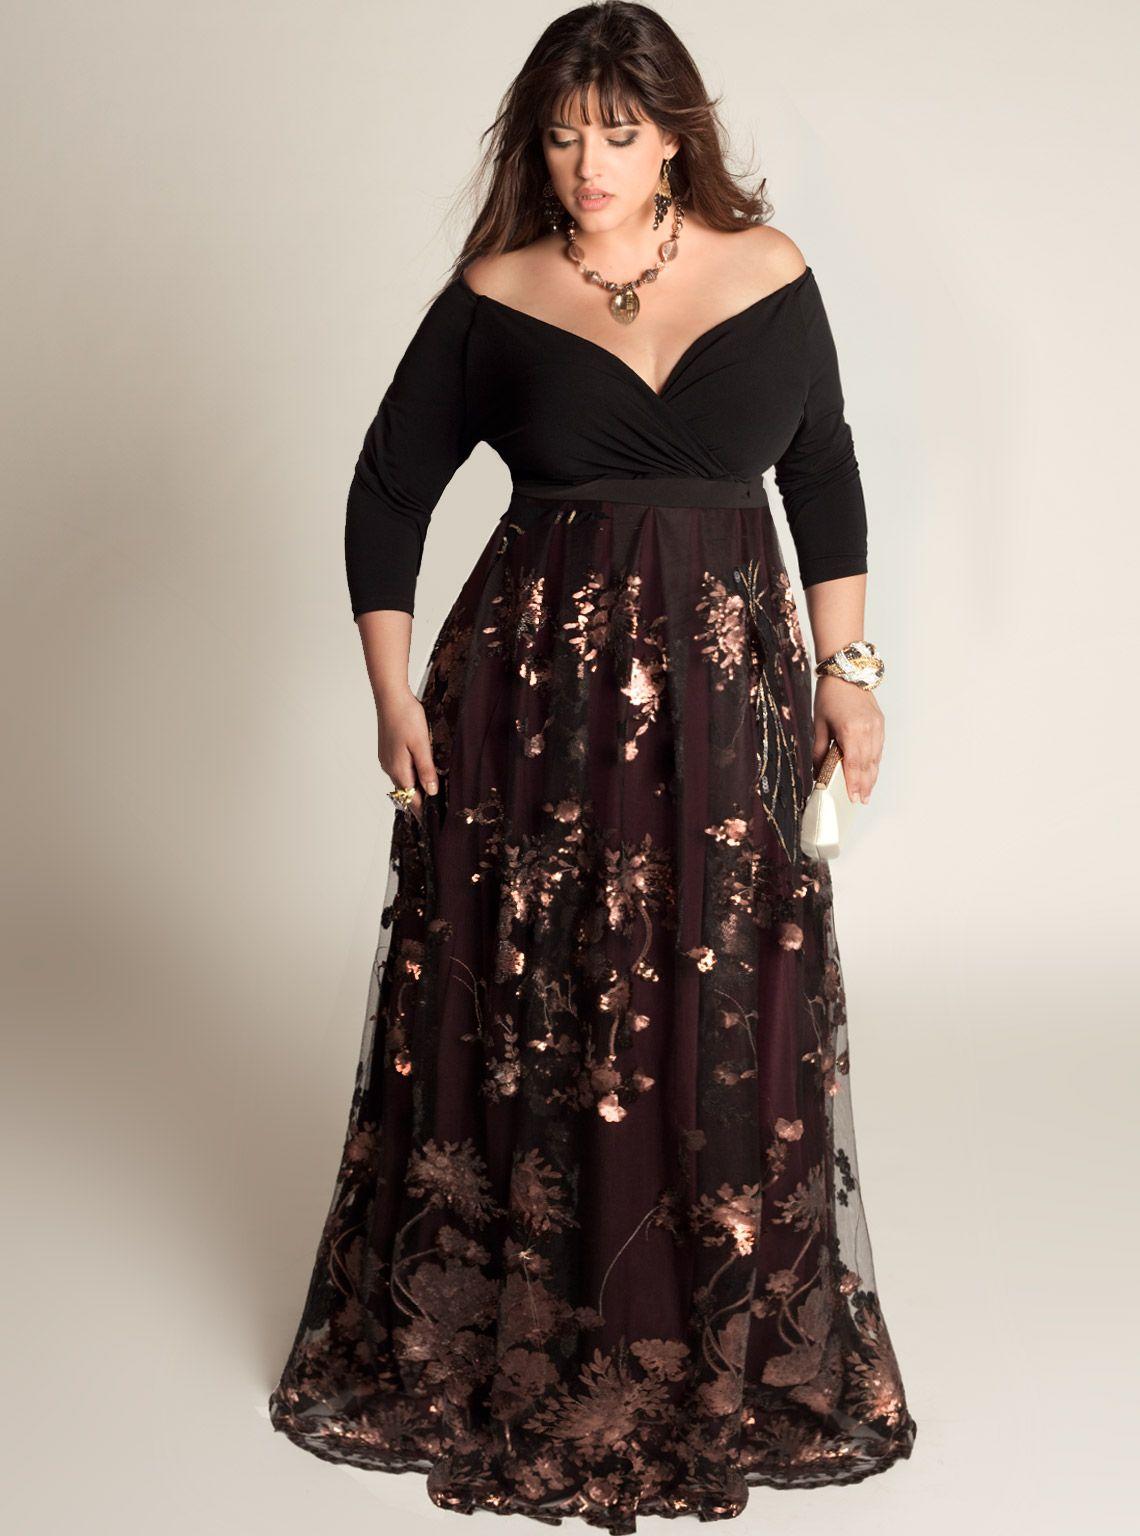 Blog plus size fasion women dresses for plus size women big